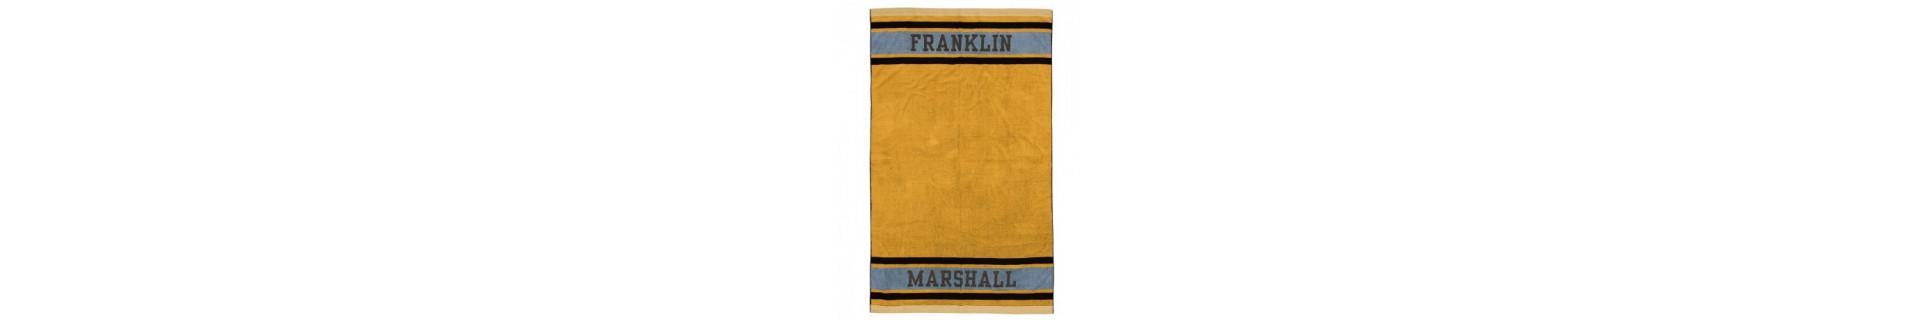 Toallas Atipick, EA7, Franklin & Marshall